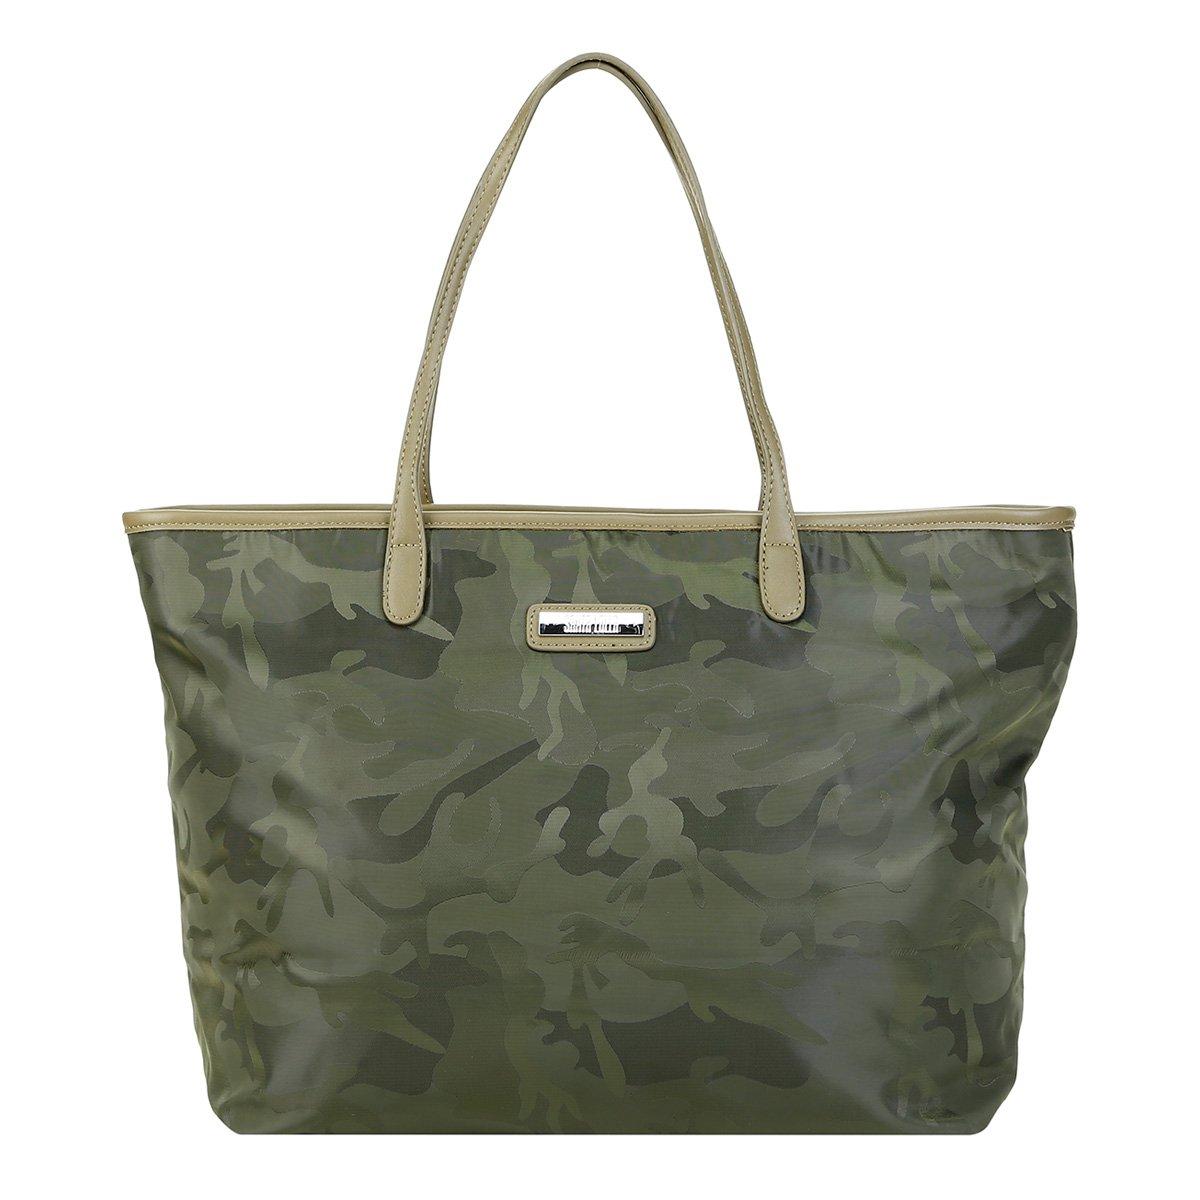 9ece0721f Bolsa Santa Lolla Shopper Camuflada Feminina